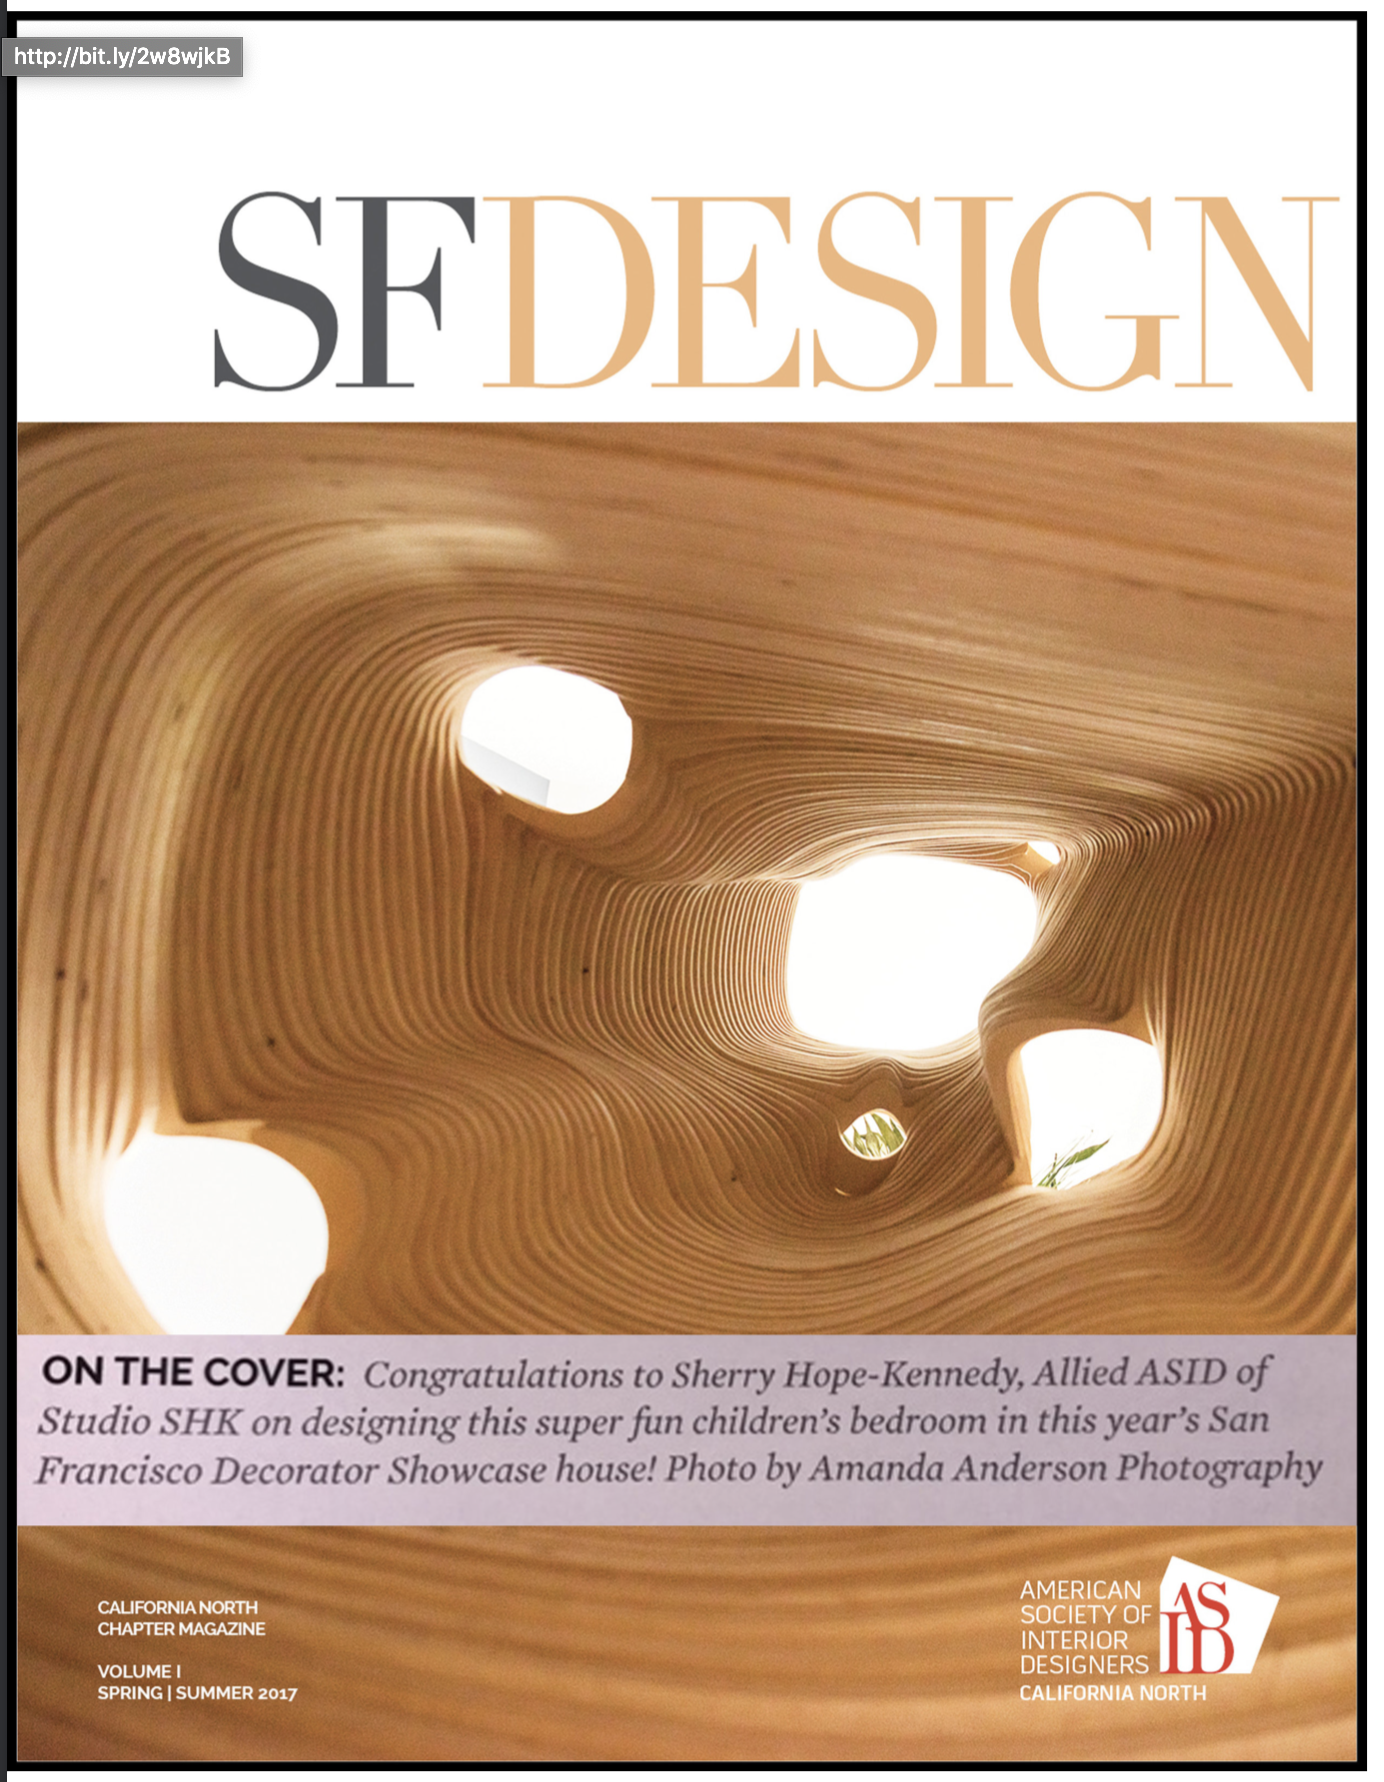 SF Design Cover by Amanda Anderson